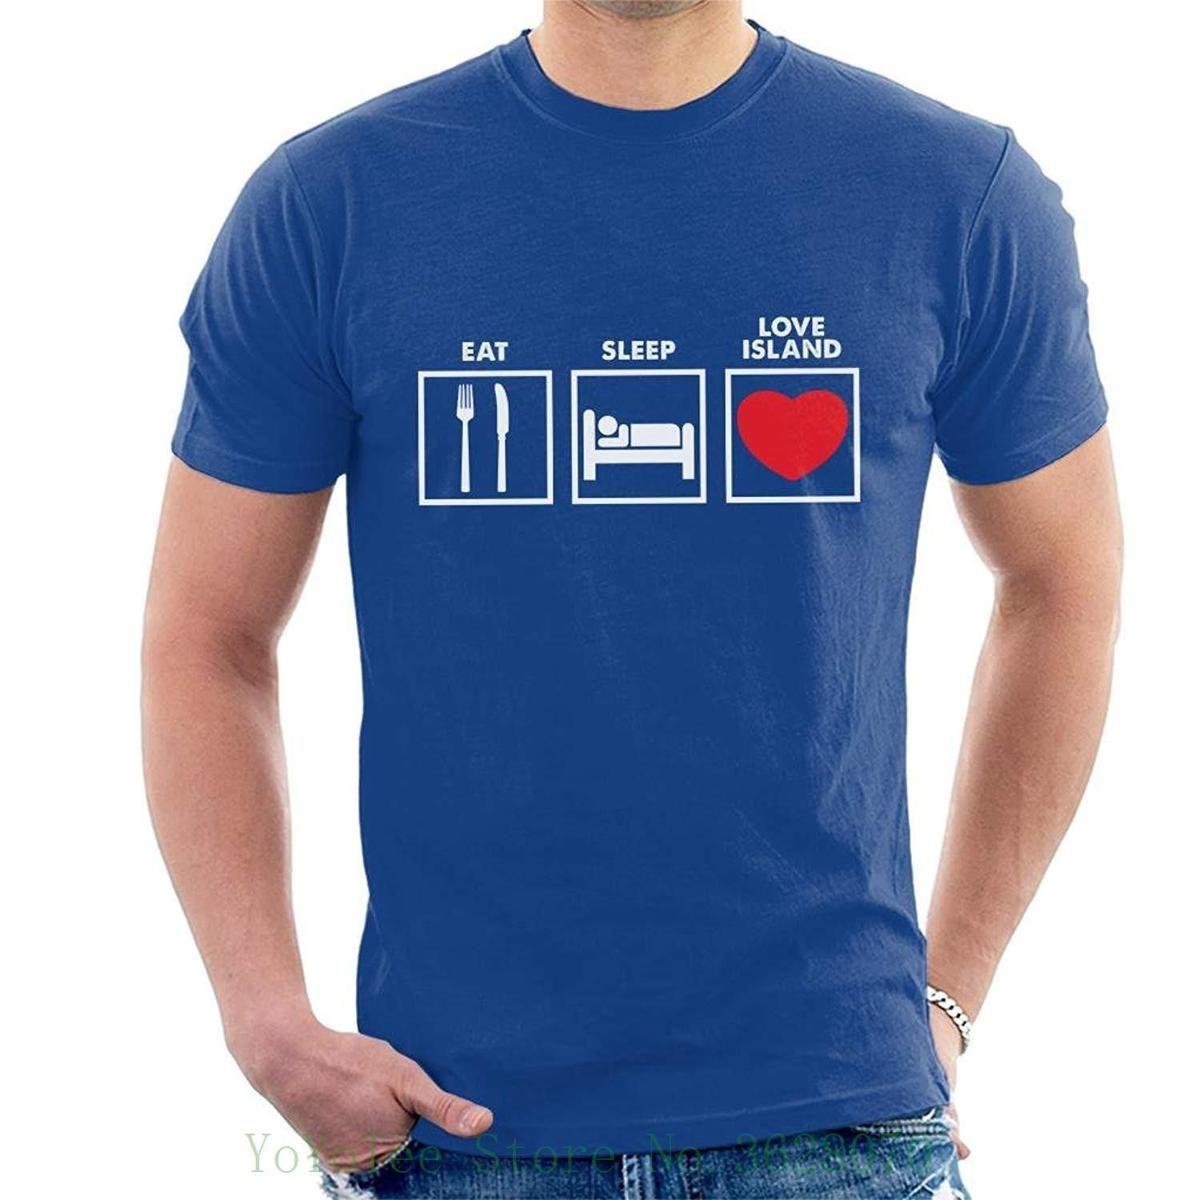 b7dbb9dcd Eat Sleep Love Island Graphics Men's T-shirt Printed T-shirt Men's Short  Sleeve O-neck T-shirts Summer Stree Twear